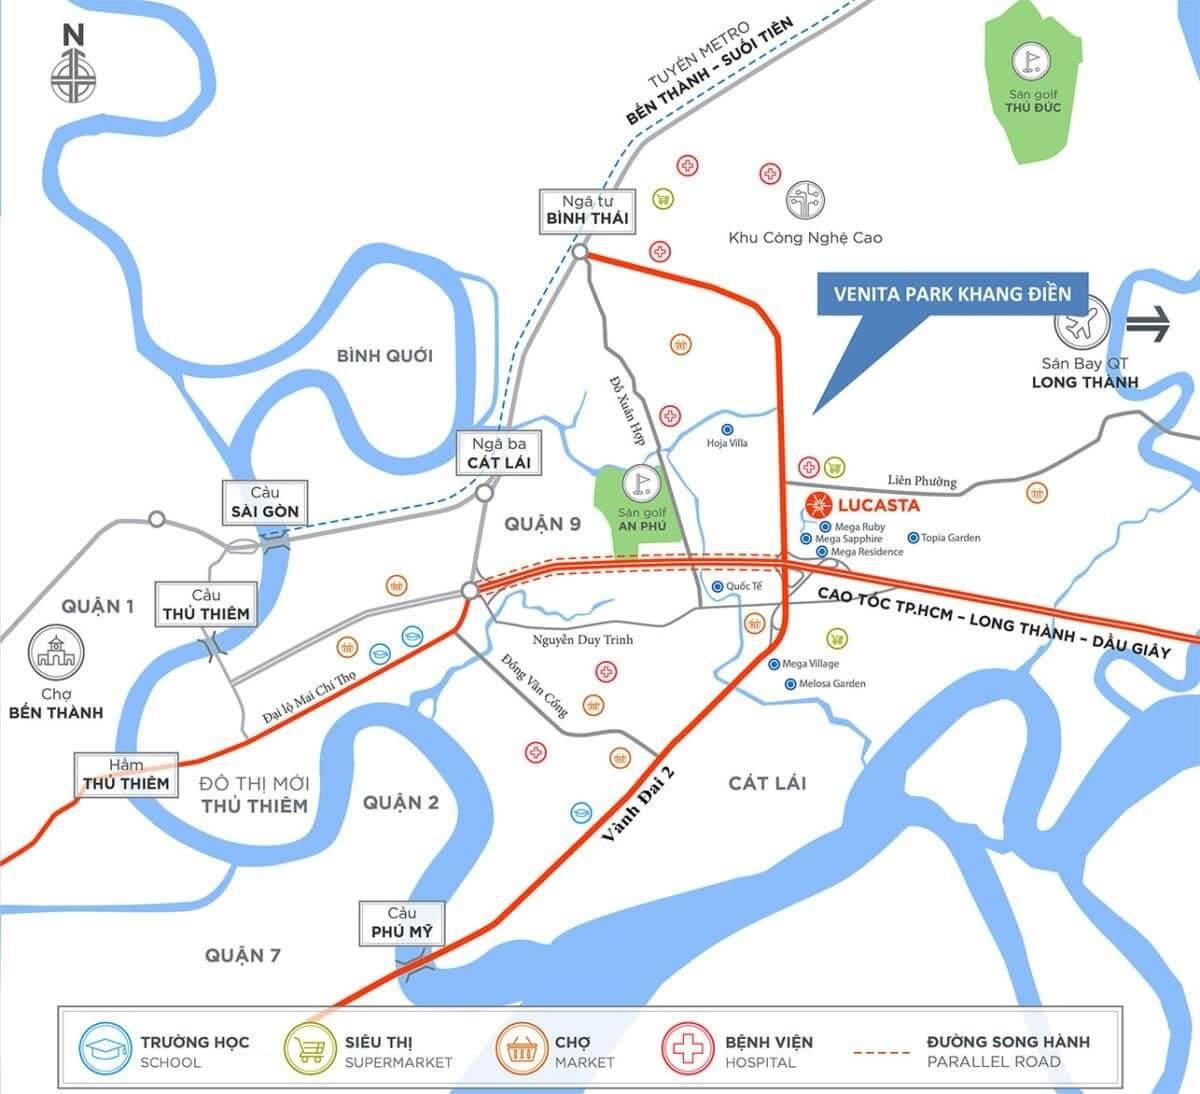 vi tri Venita Park Khang dien